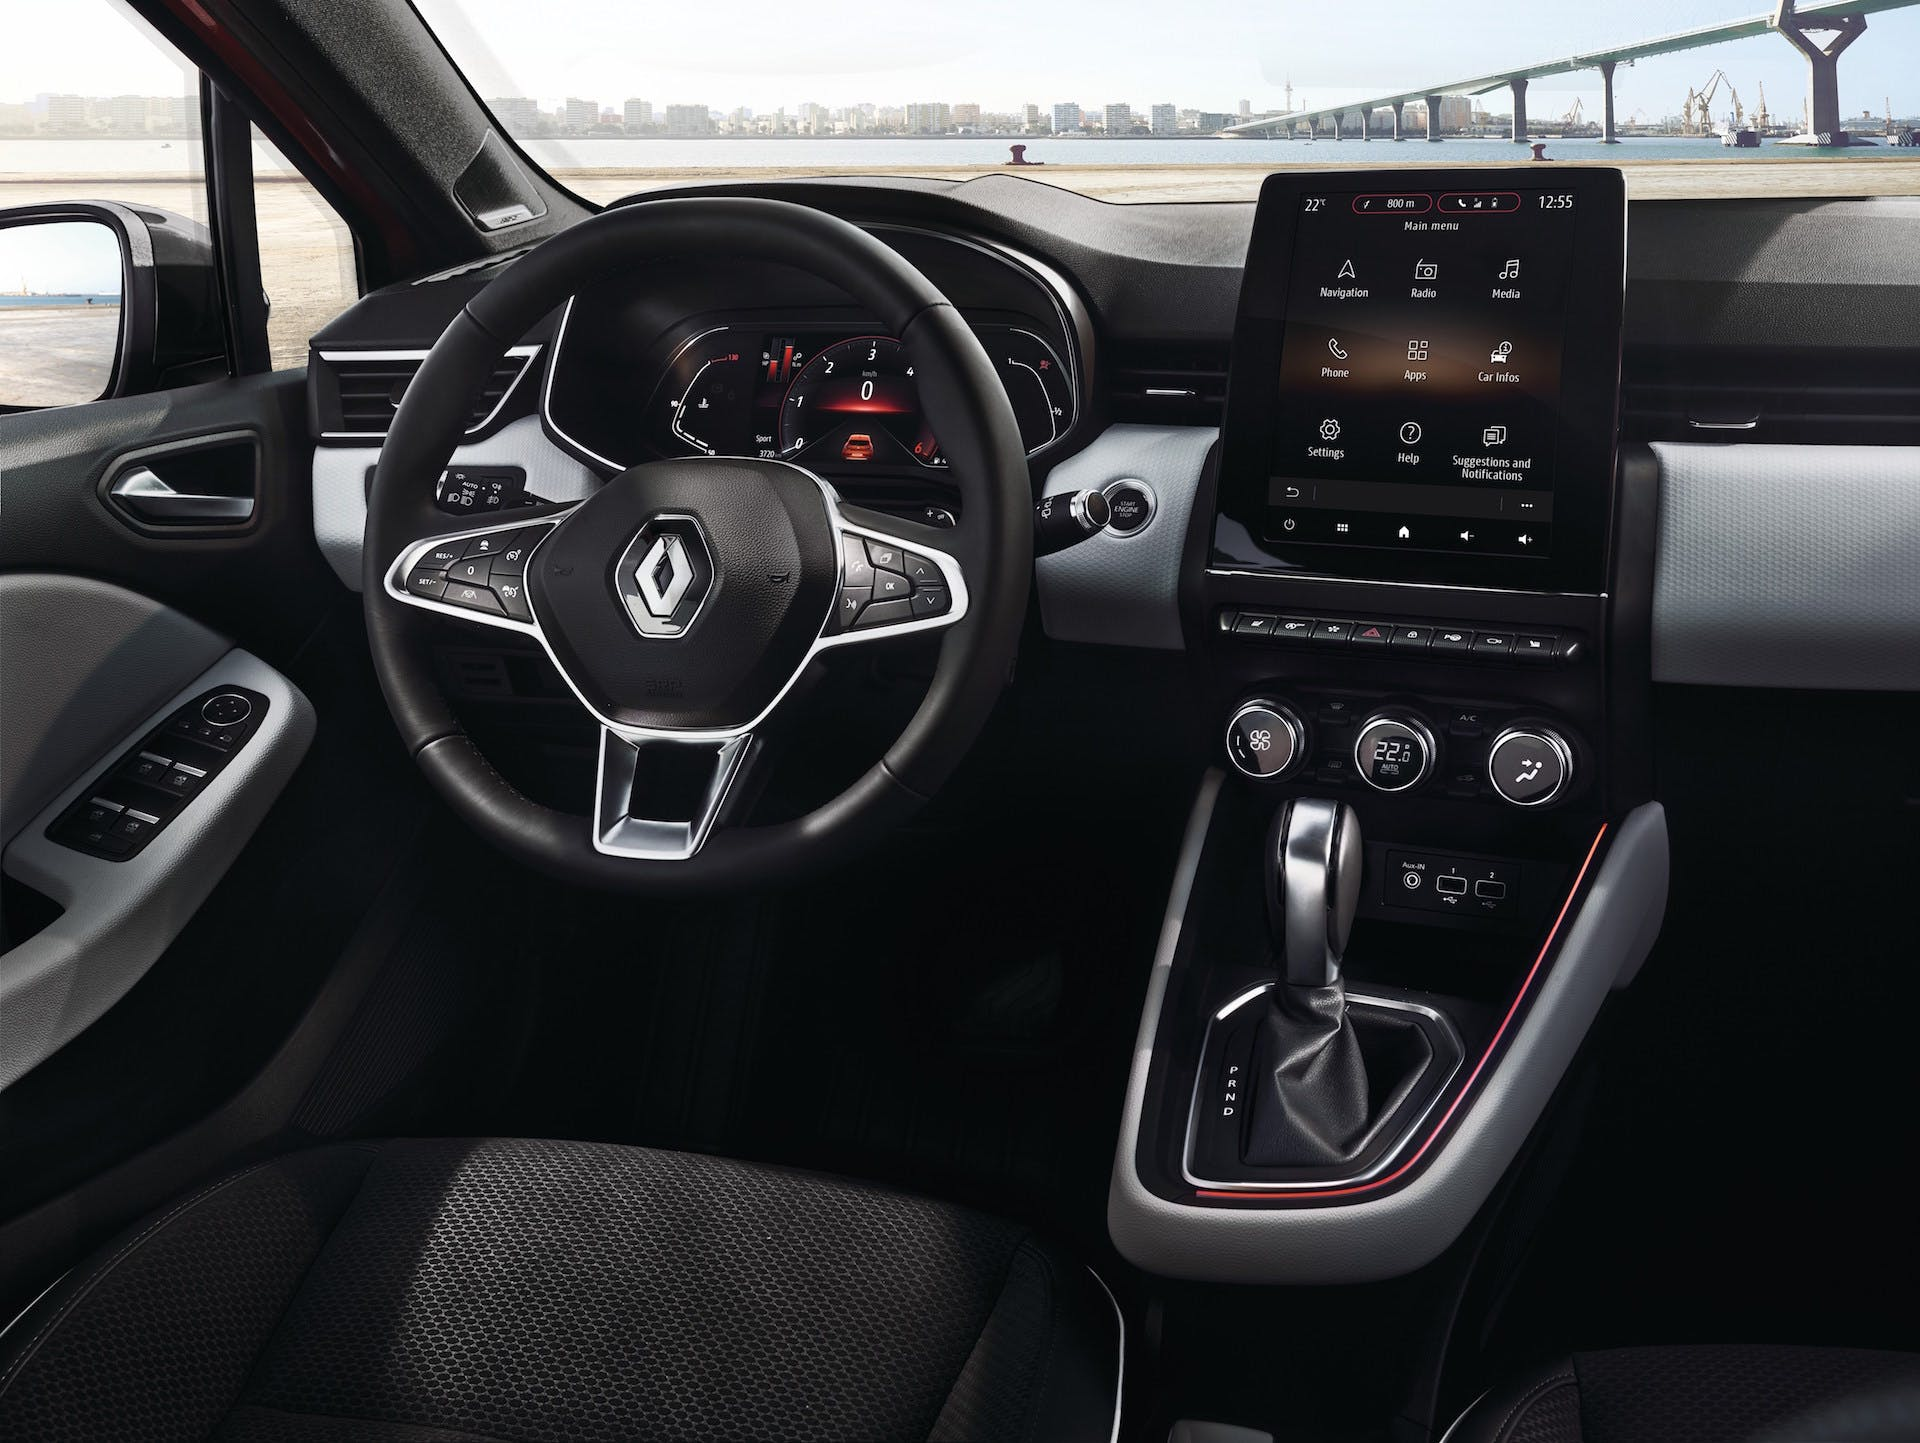 Nuova Renault Clio navigatore